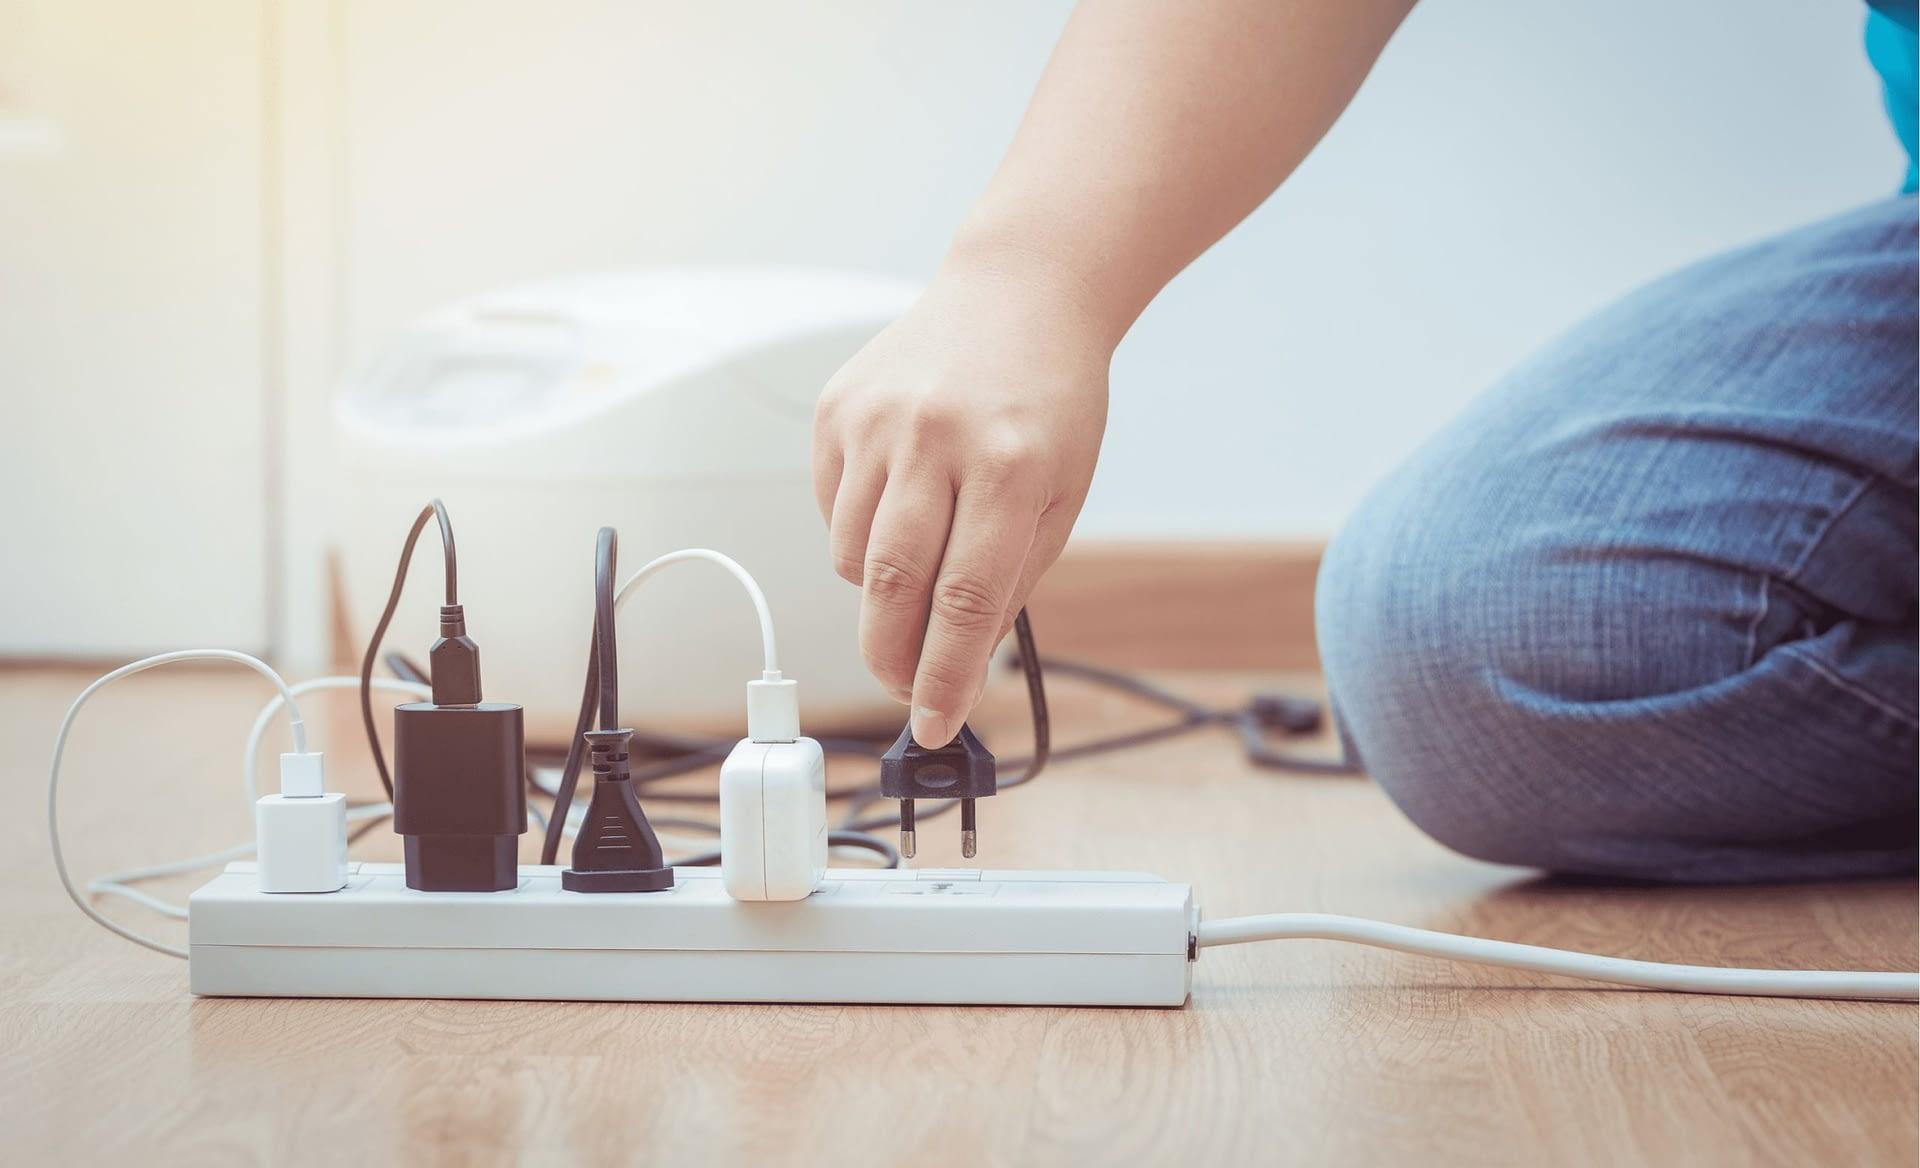 Arizona urge to reduce electricity consumption